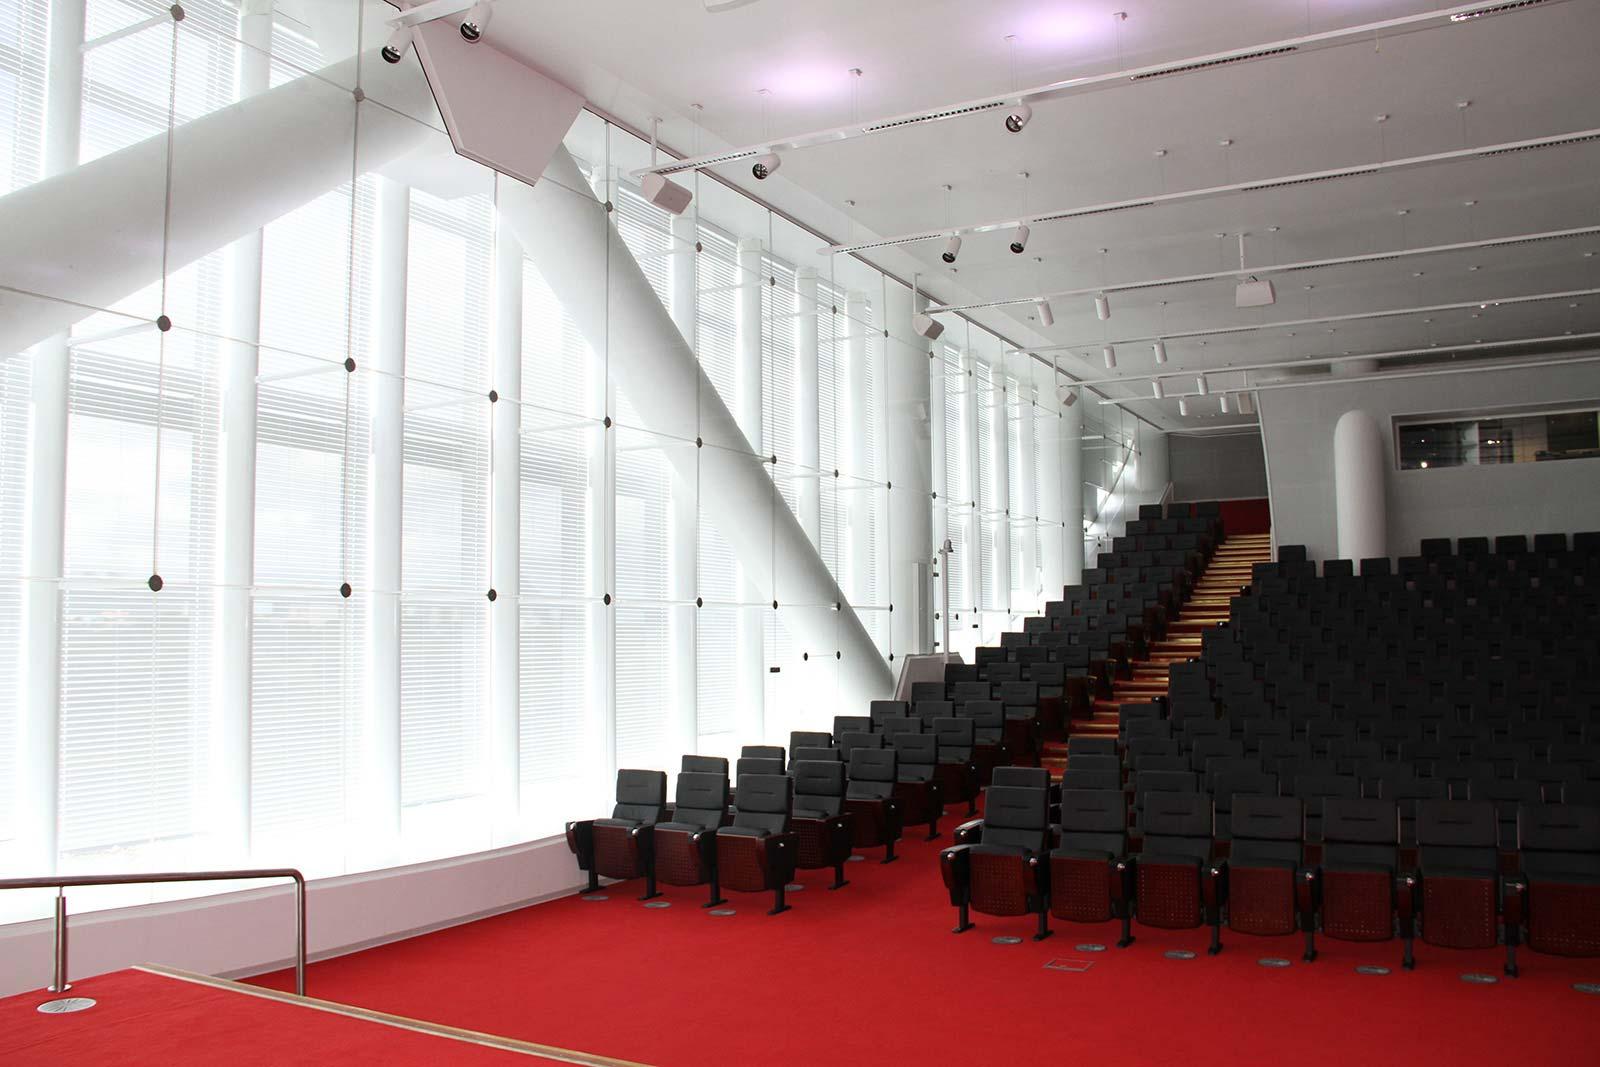 the-mauritius-commercial-bank-ebene-jean-francois-koenig-auditorium-view